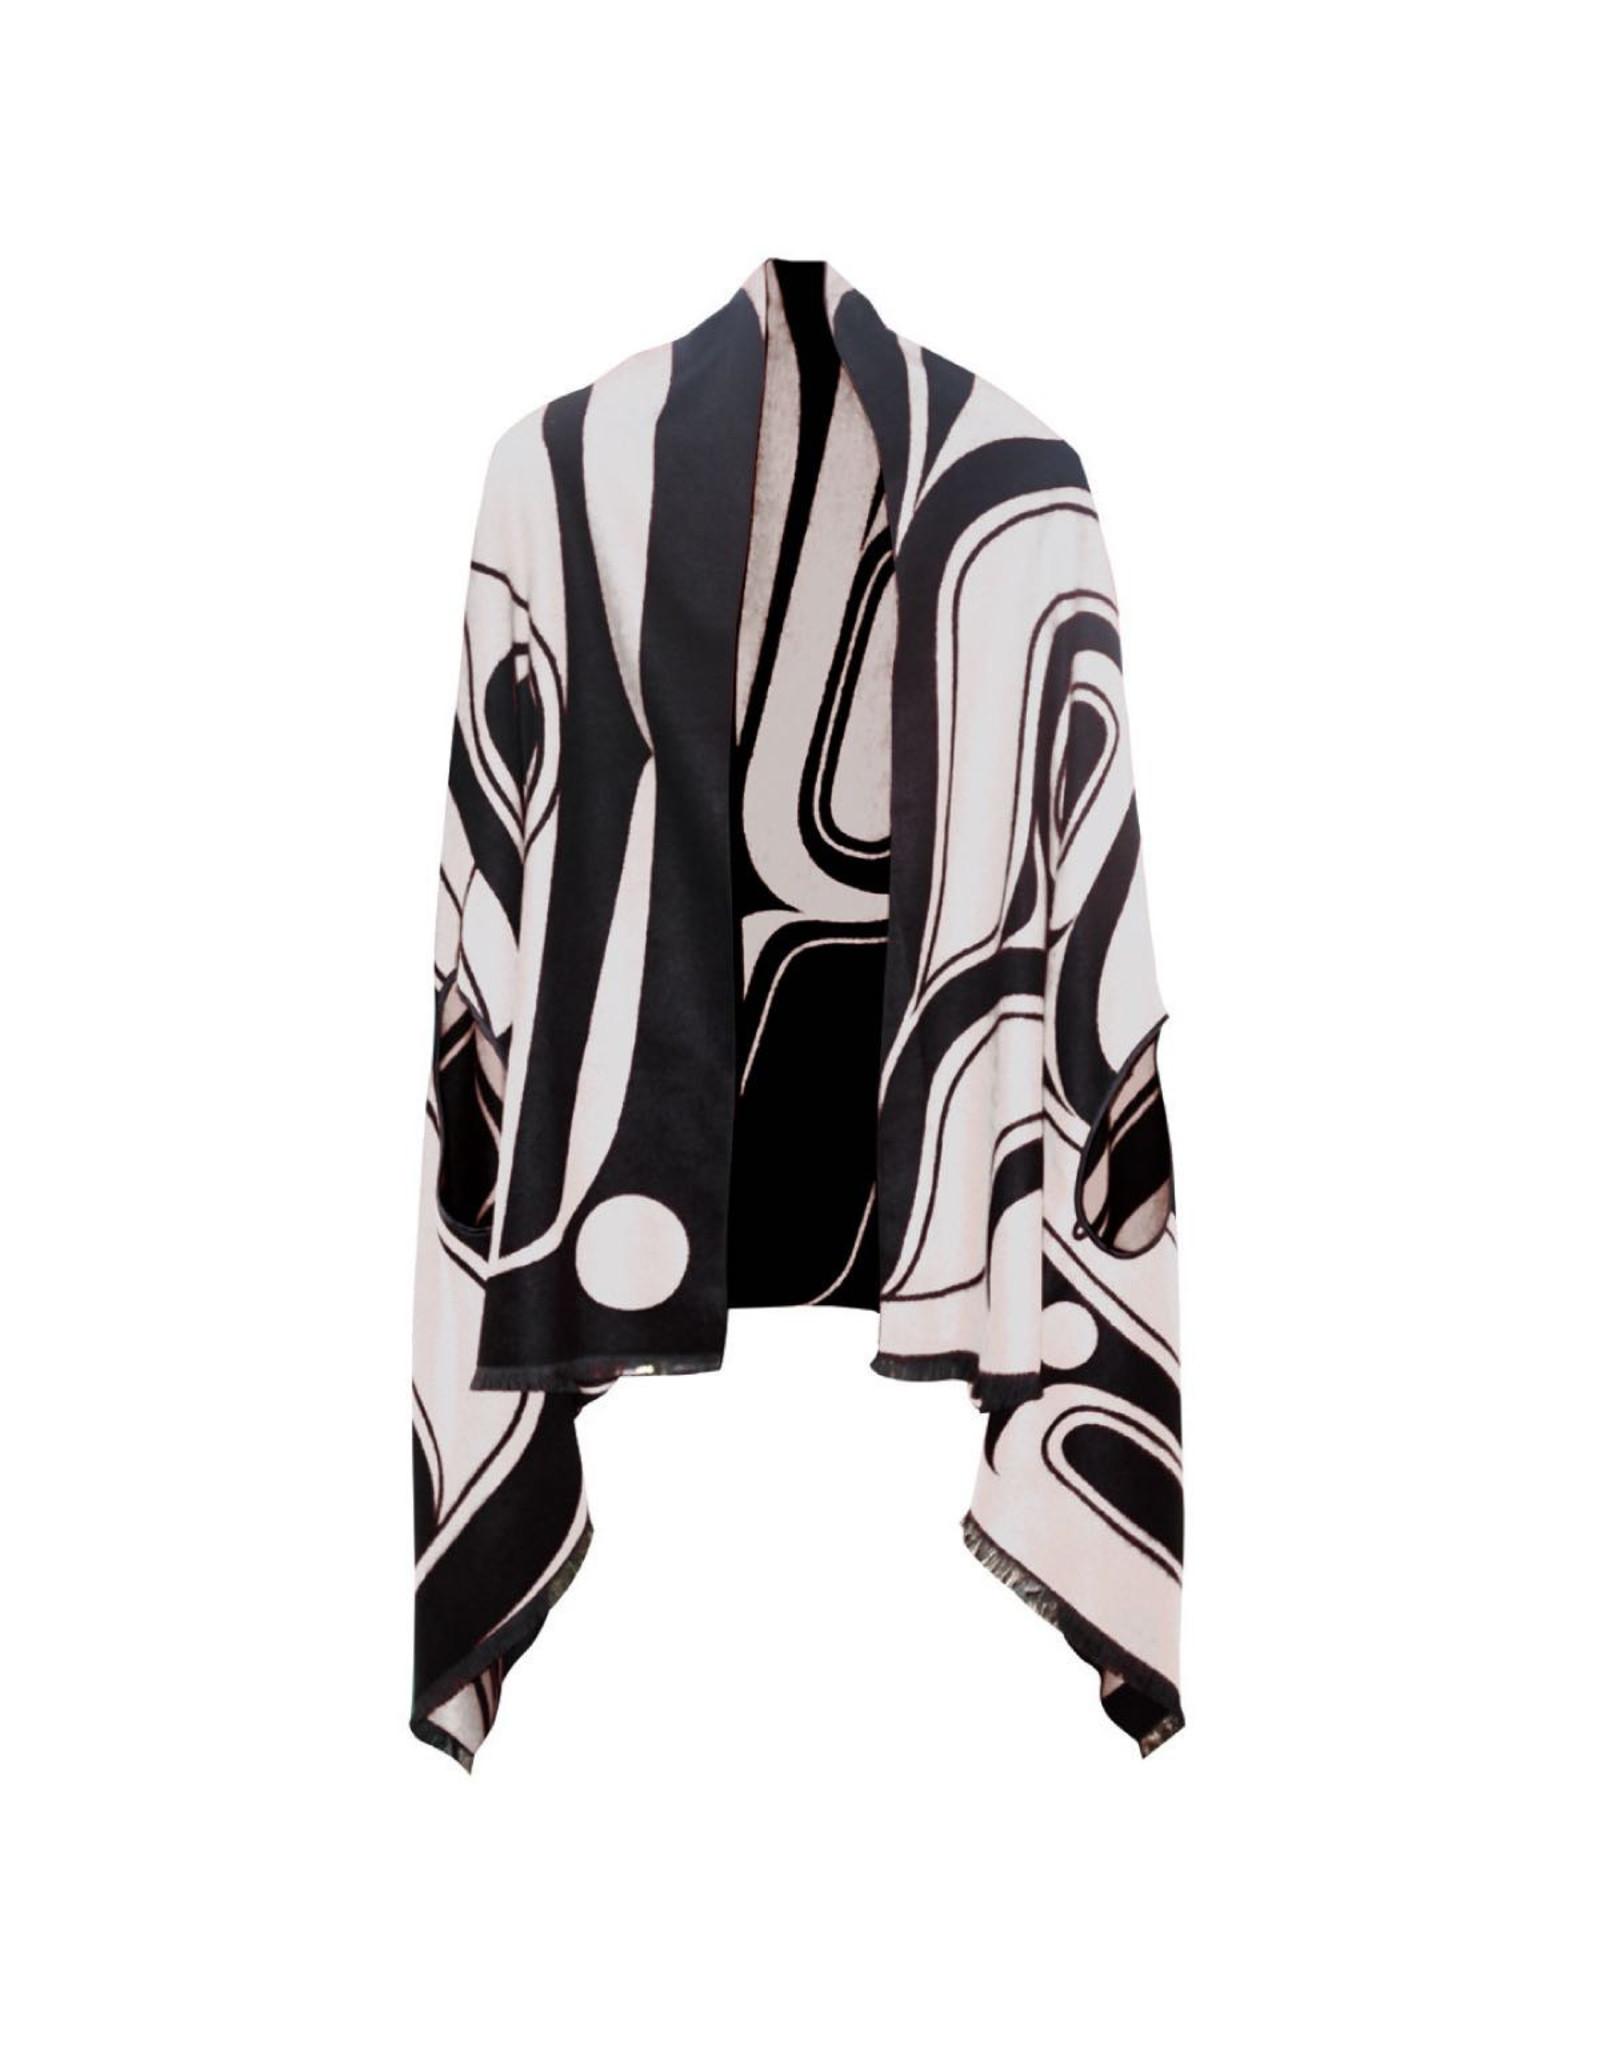 Reversible Fashion Cape - Tradition By Ryan Cranmer (Black & White)